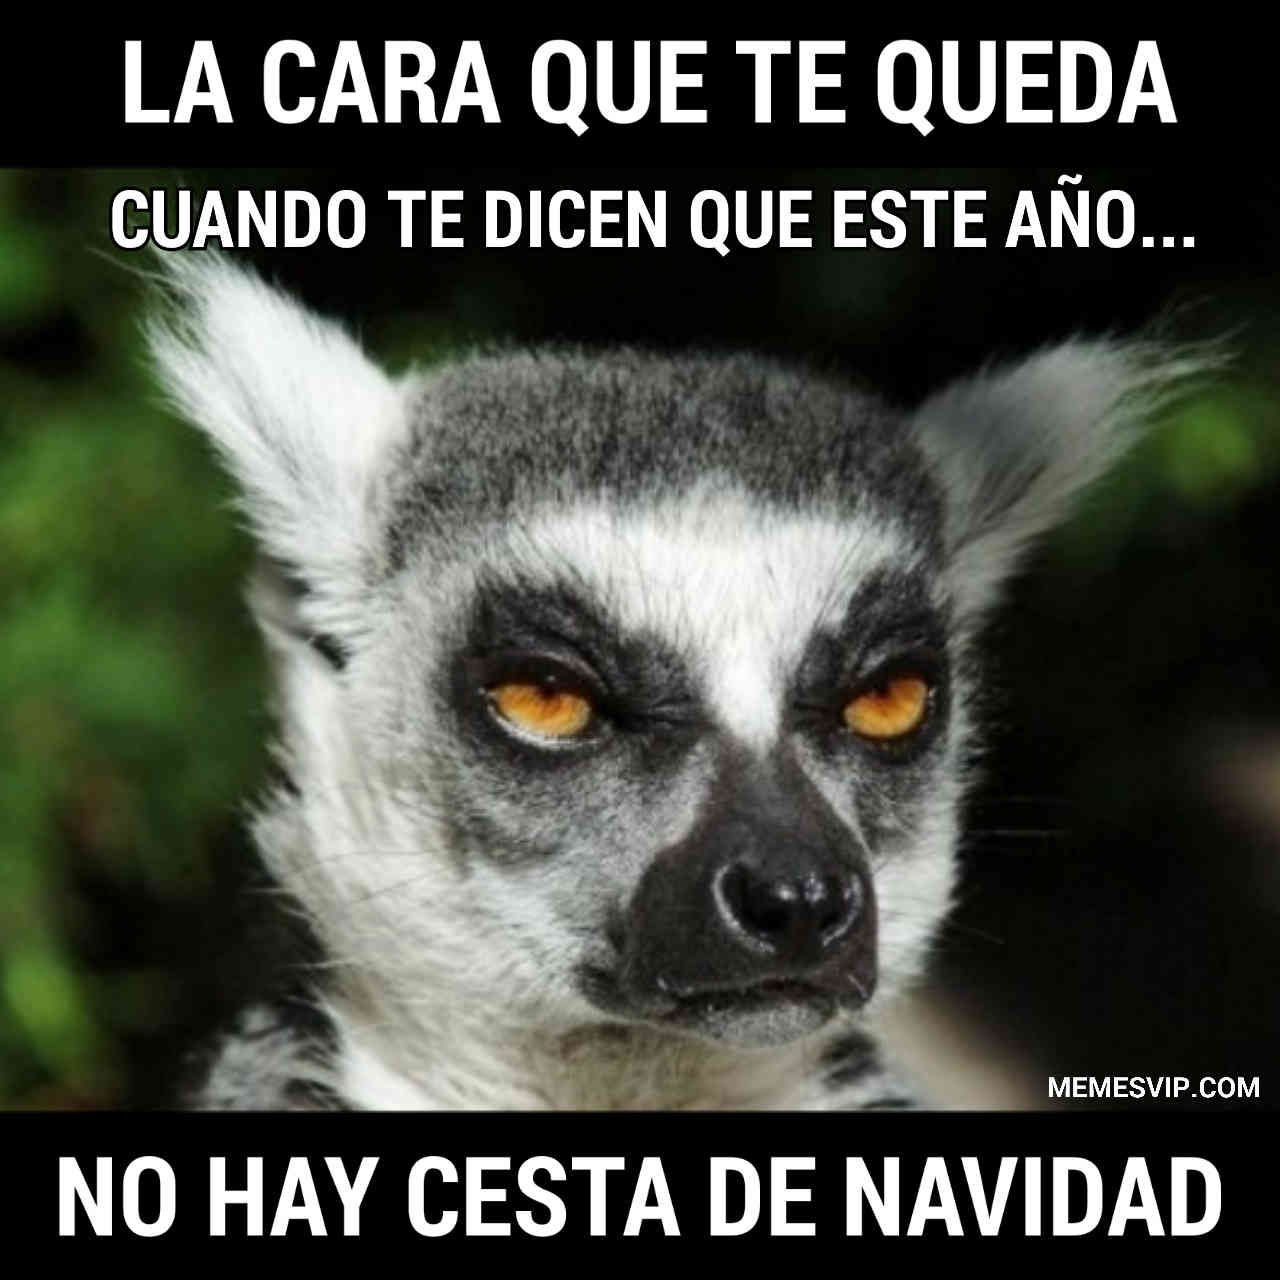 Cesta De Navidad Meme Memes En Espanol English Memes Memes Nuevos Imagenes De Risa Memes Mejores Memes